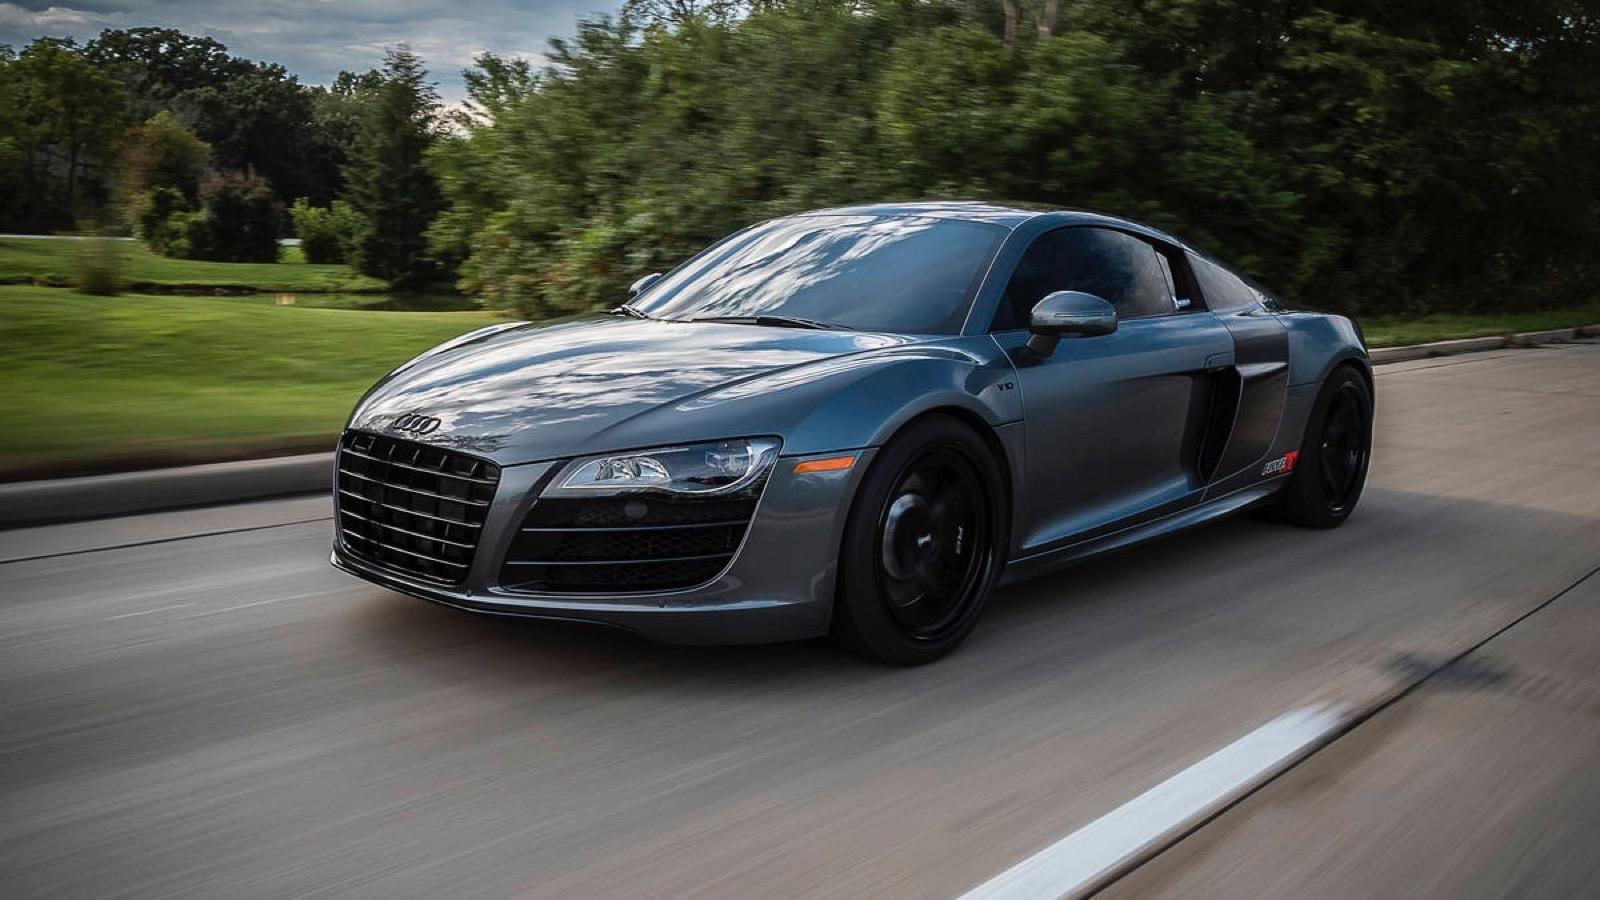 Audi_R8_AMS_Alpha_10_11